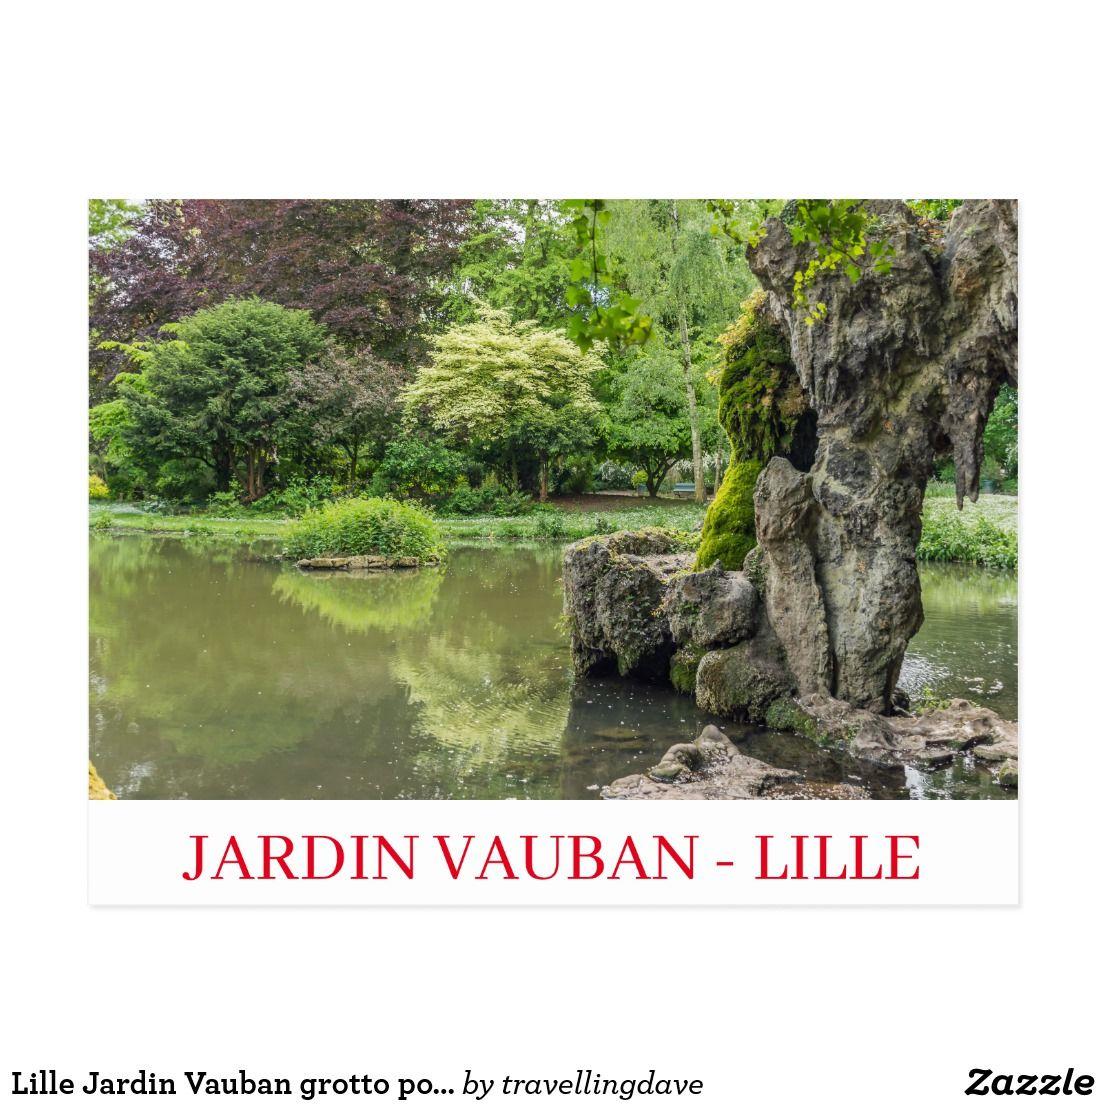 Lille Jardin Vauban Grotto Postcard Zazzle Co Uk In 2020 Lille